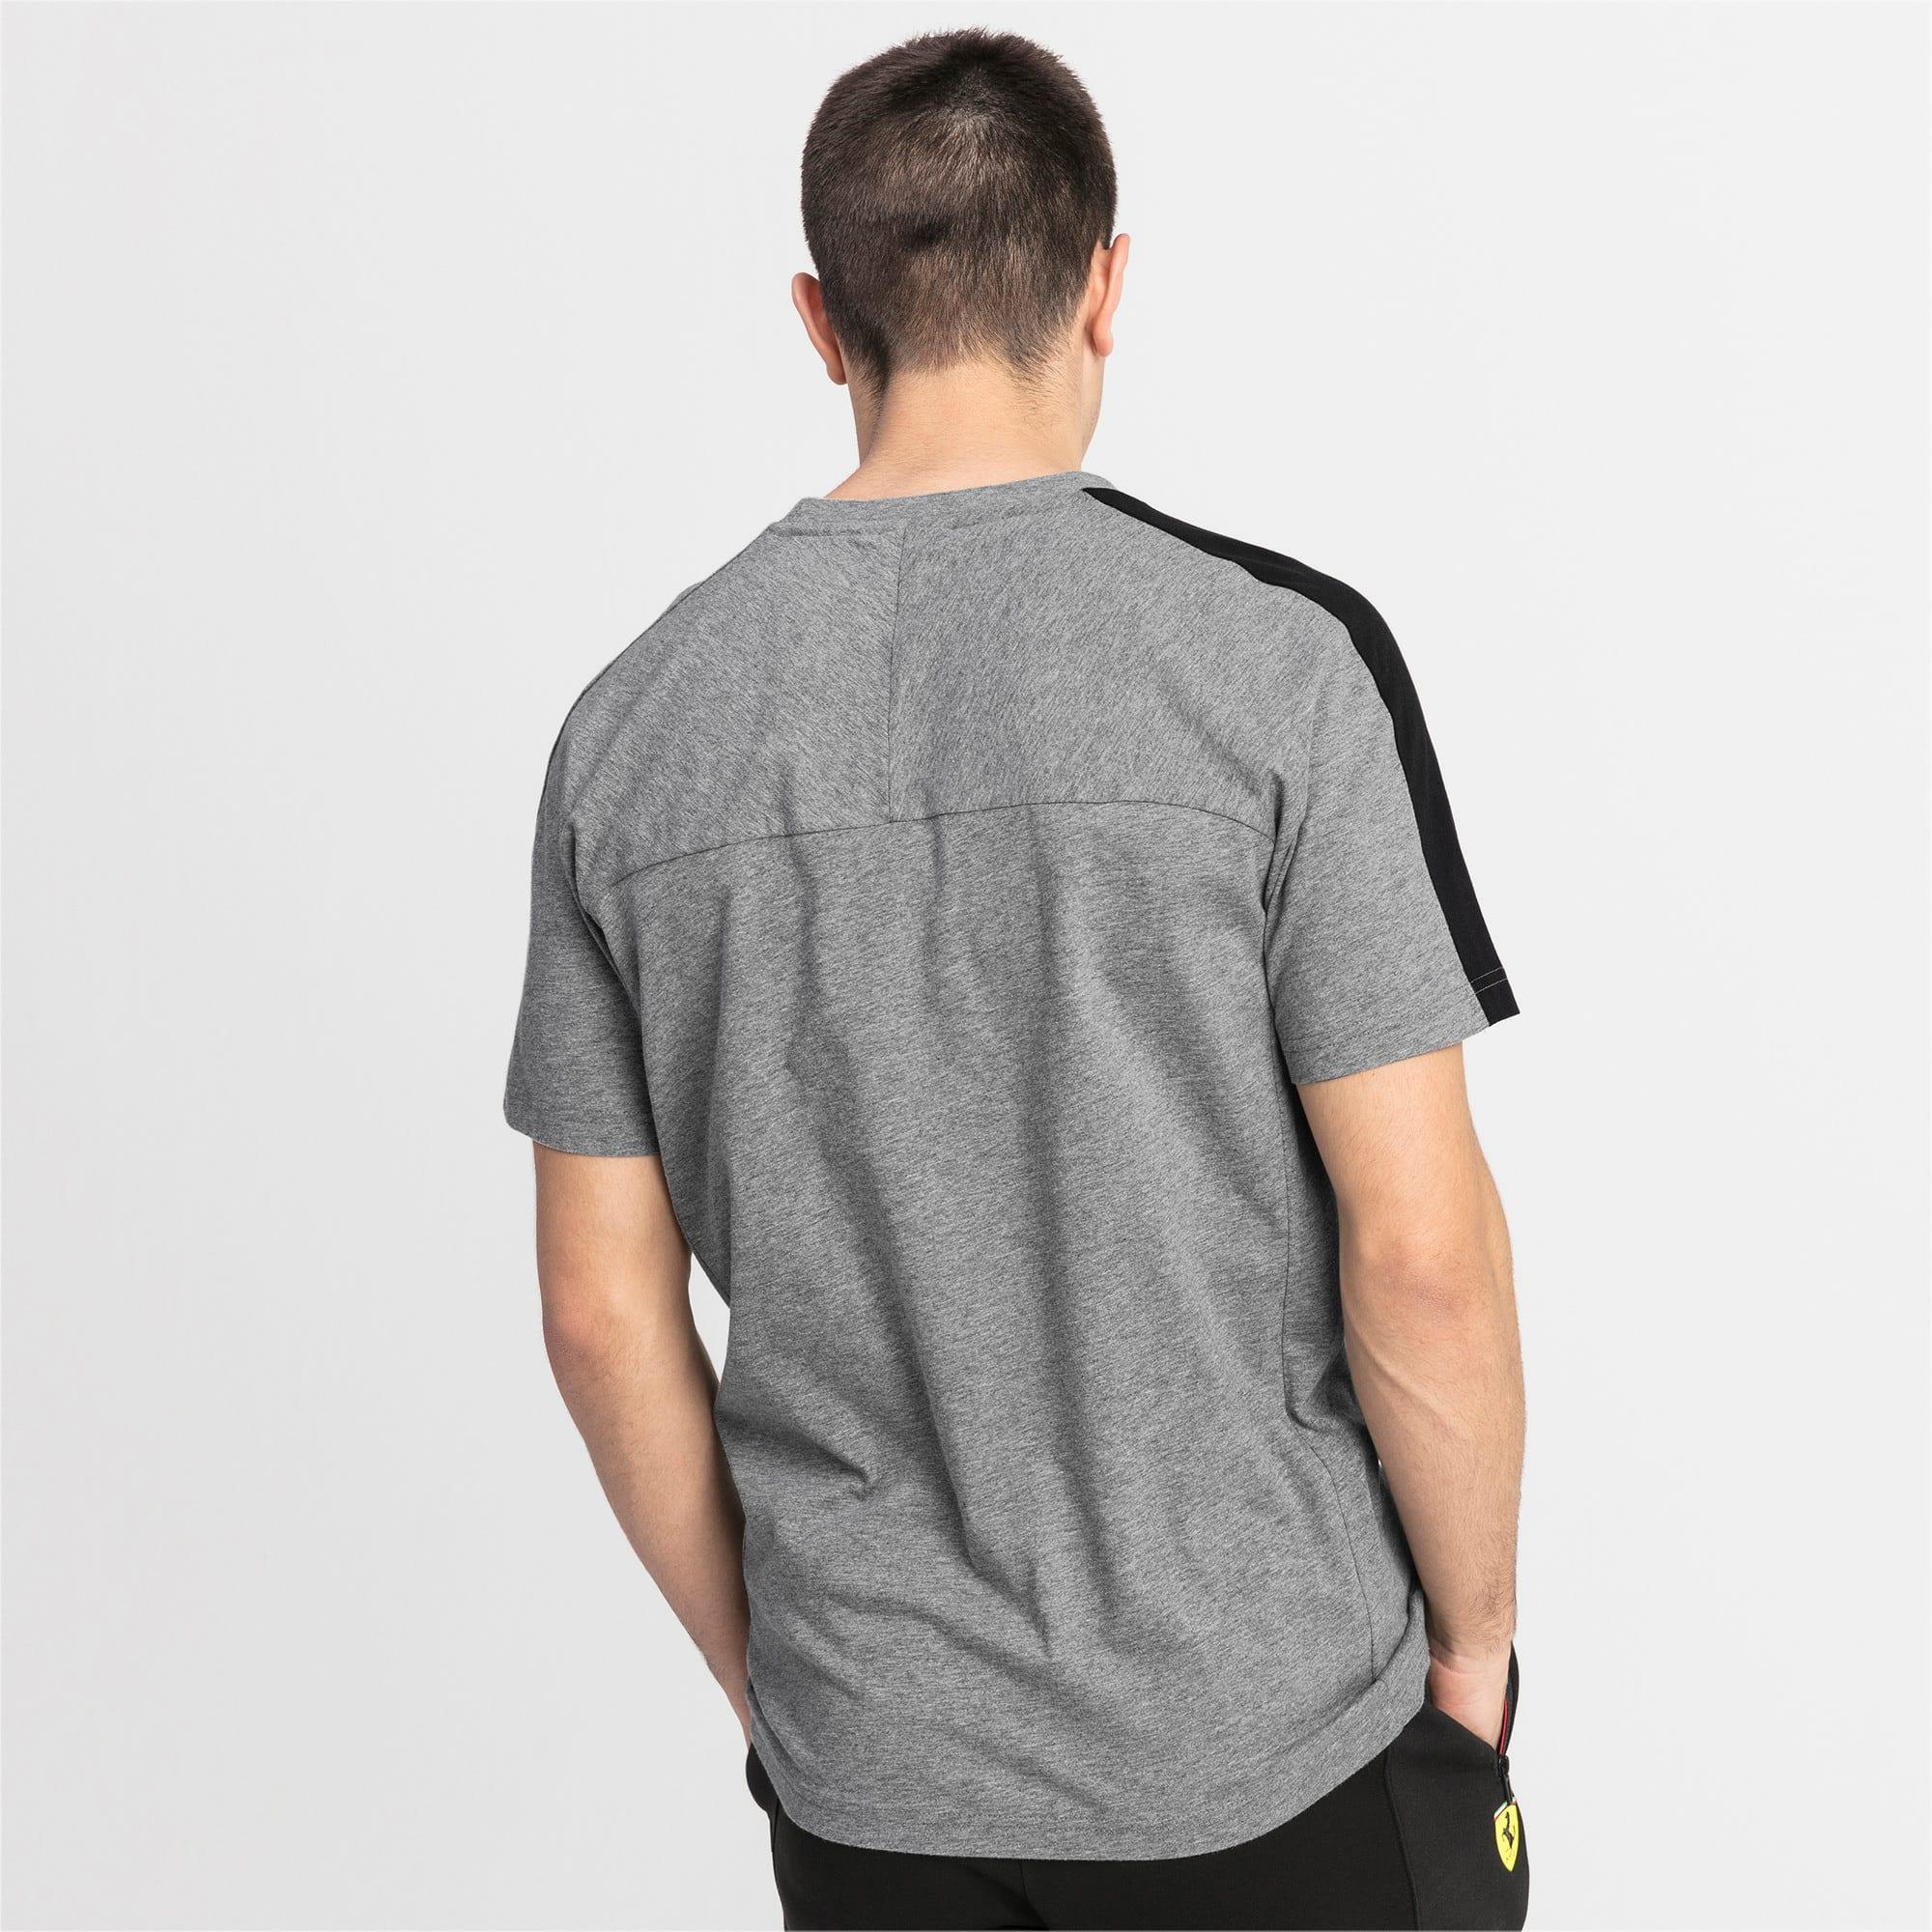 Thumbnail 2 of T-shirt Scuderia Ferrari T7 uomo, Medium Gray Heather, medium